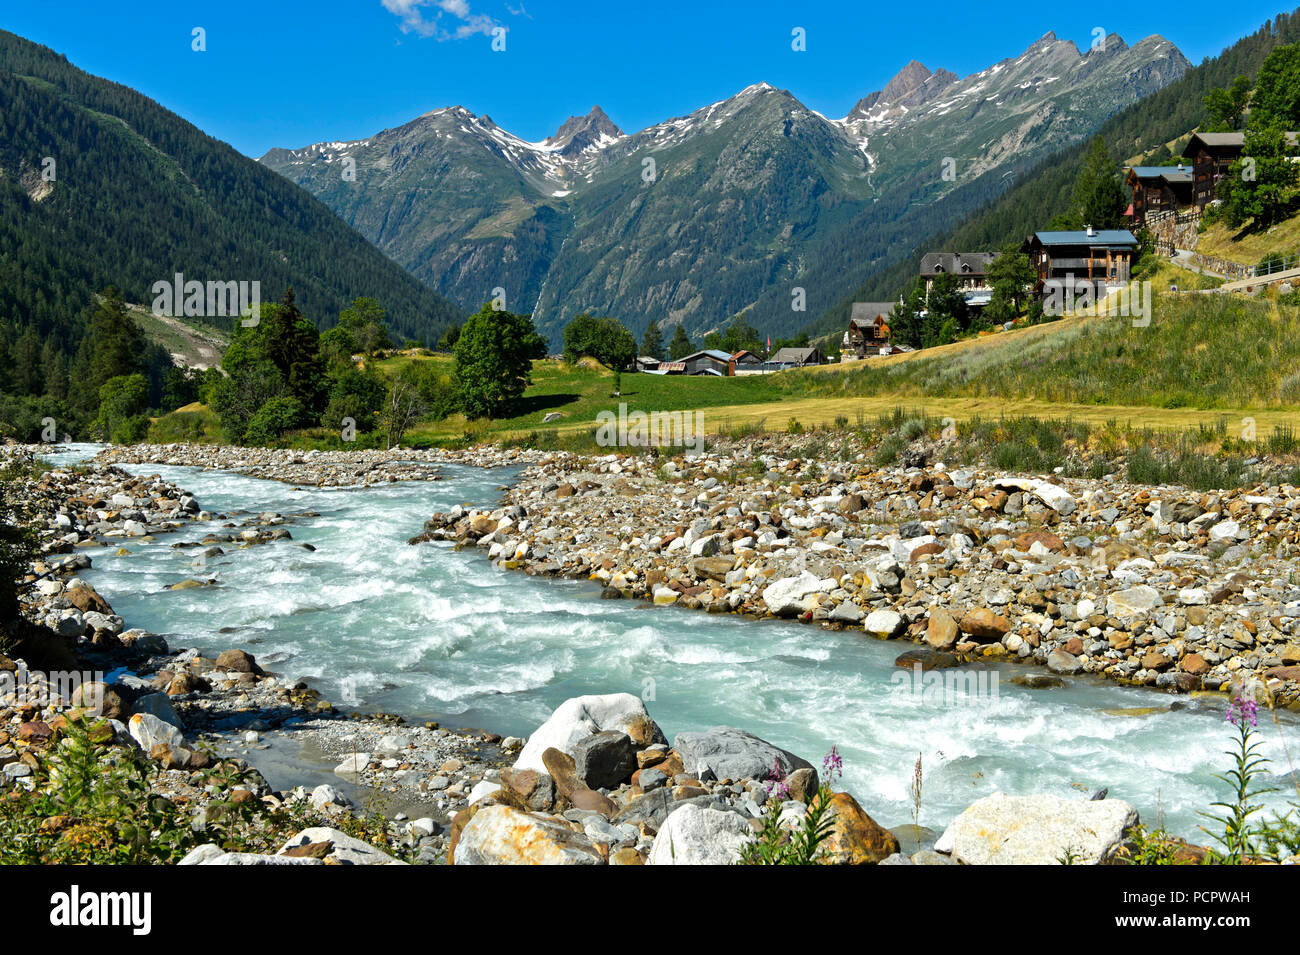 Bed of the mountain river Lonza near the hamlet Ried, Blatten, Loetschental Valley, Switzerland - Stock Image